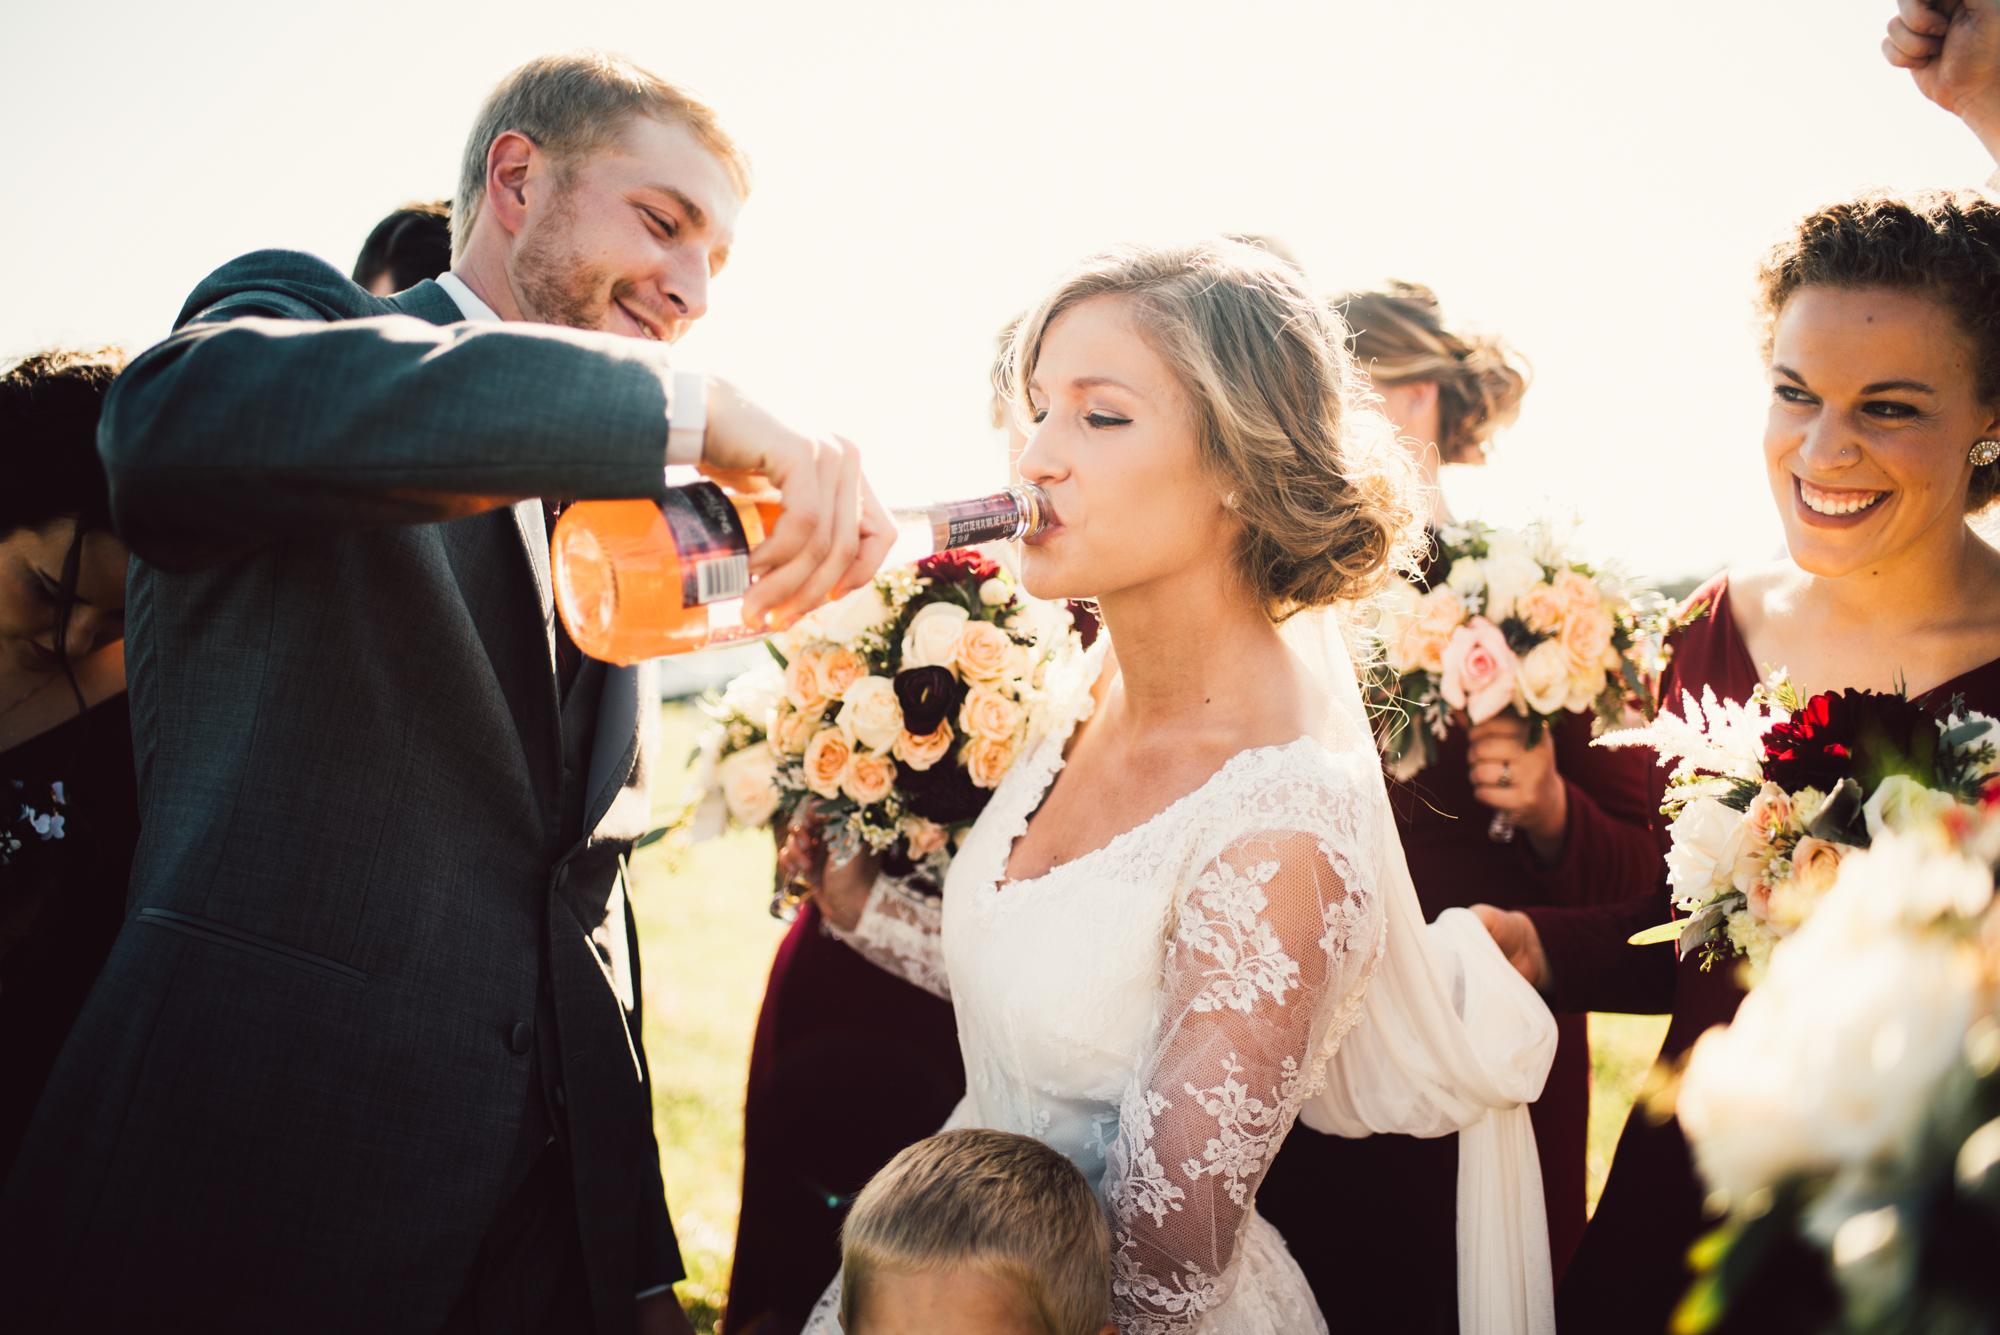 Ashley-and-Michael-Beaune-Woodstock-Virginia-Wedding-Shenandoah-Valley_23.JPG